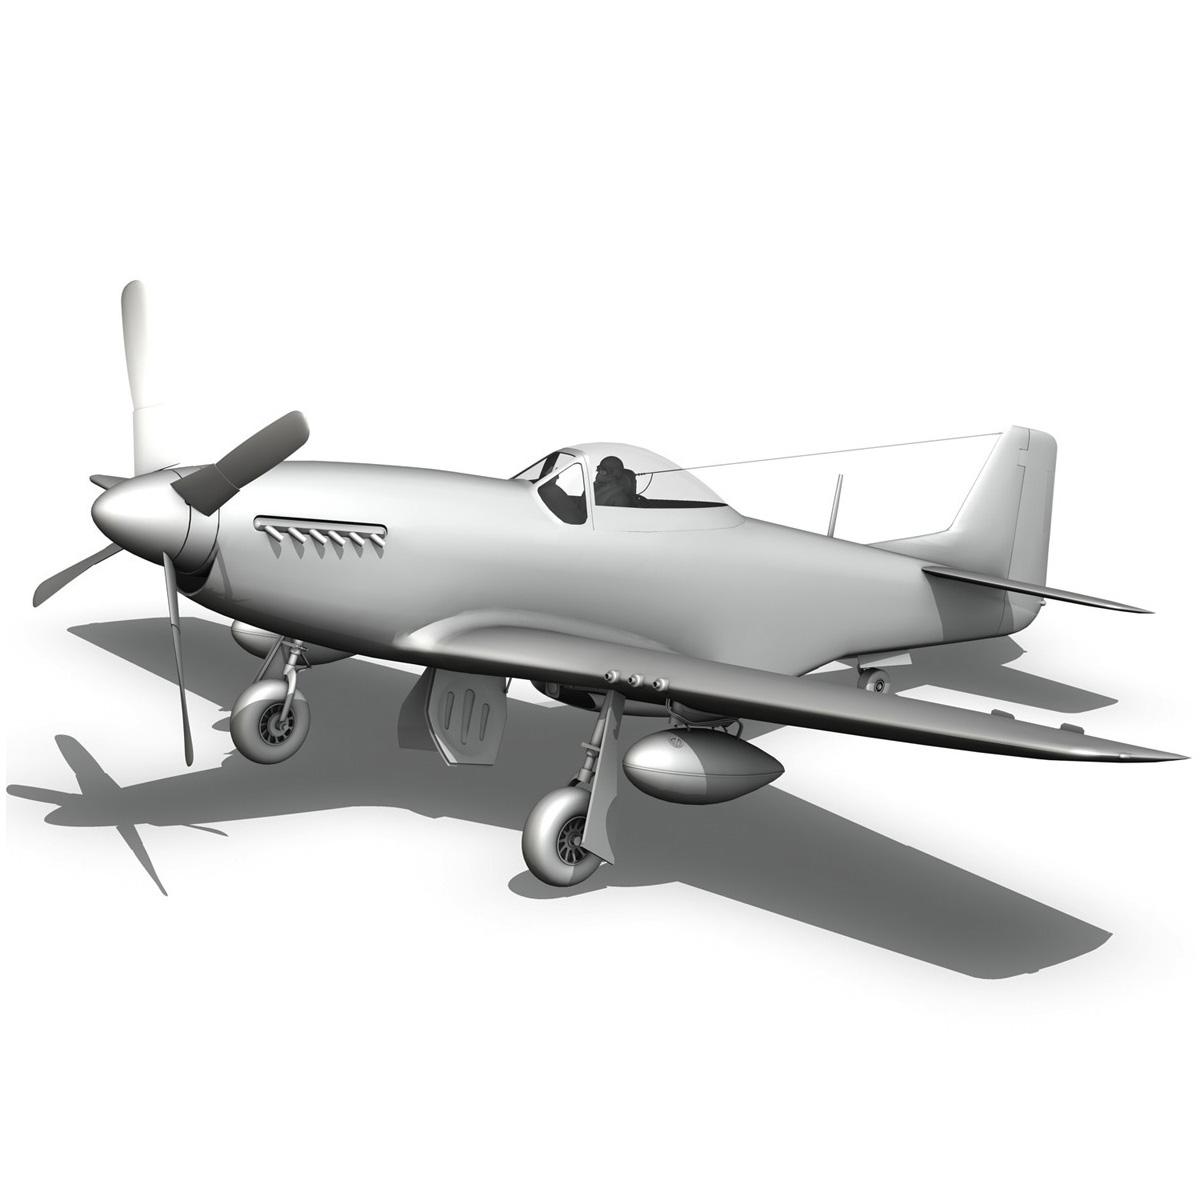 north american p-51d mustang – stinky 3d model fbx c4d lwo obj 269613